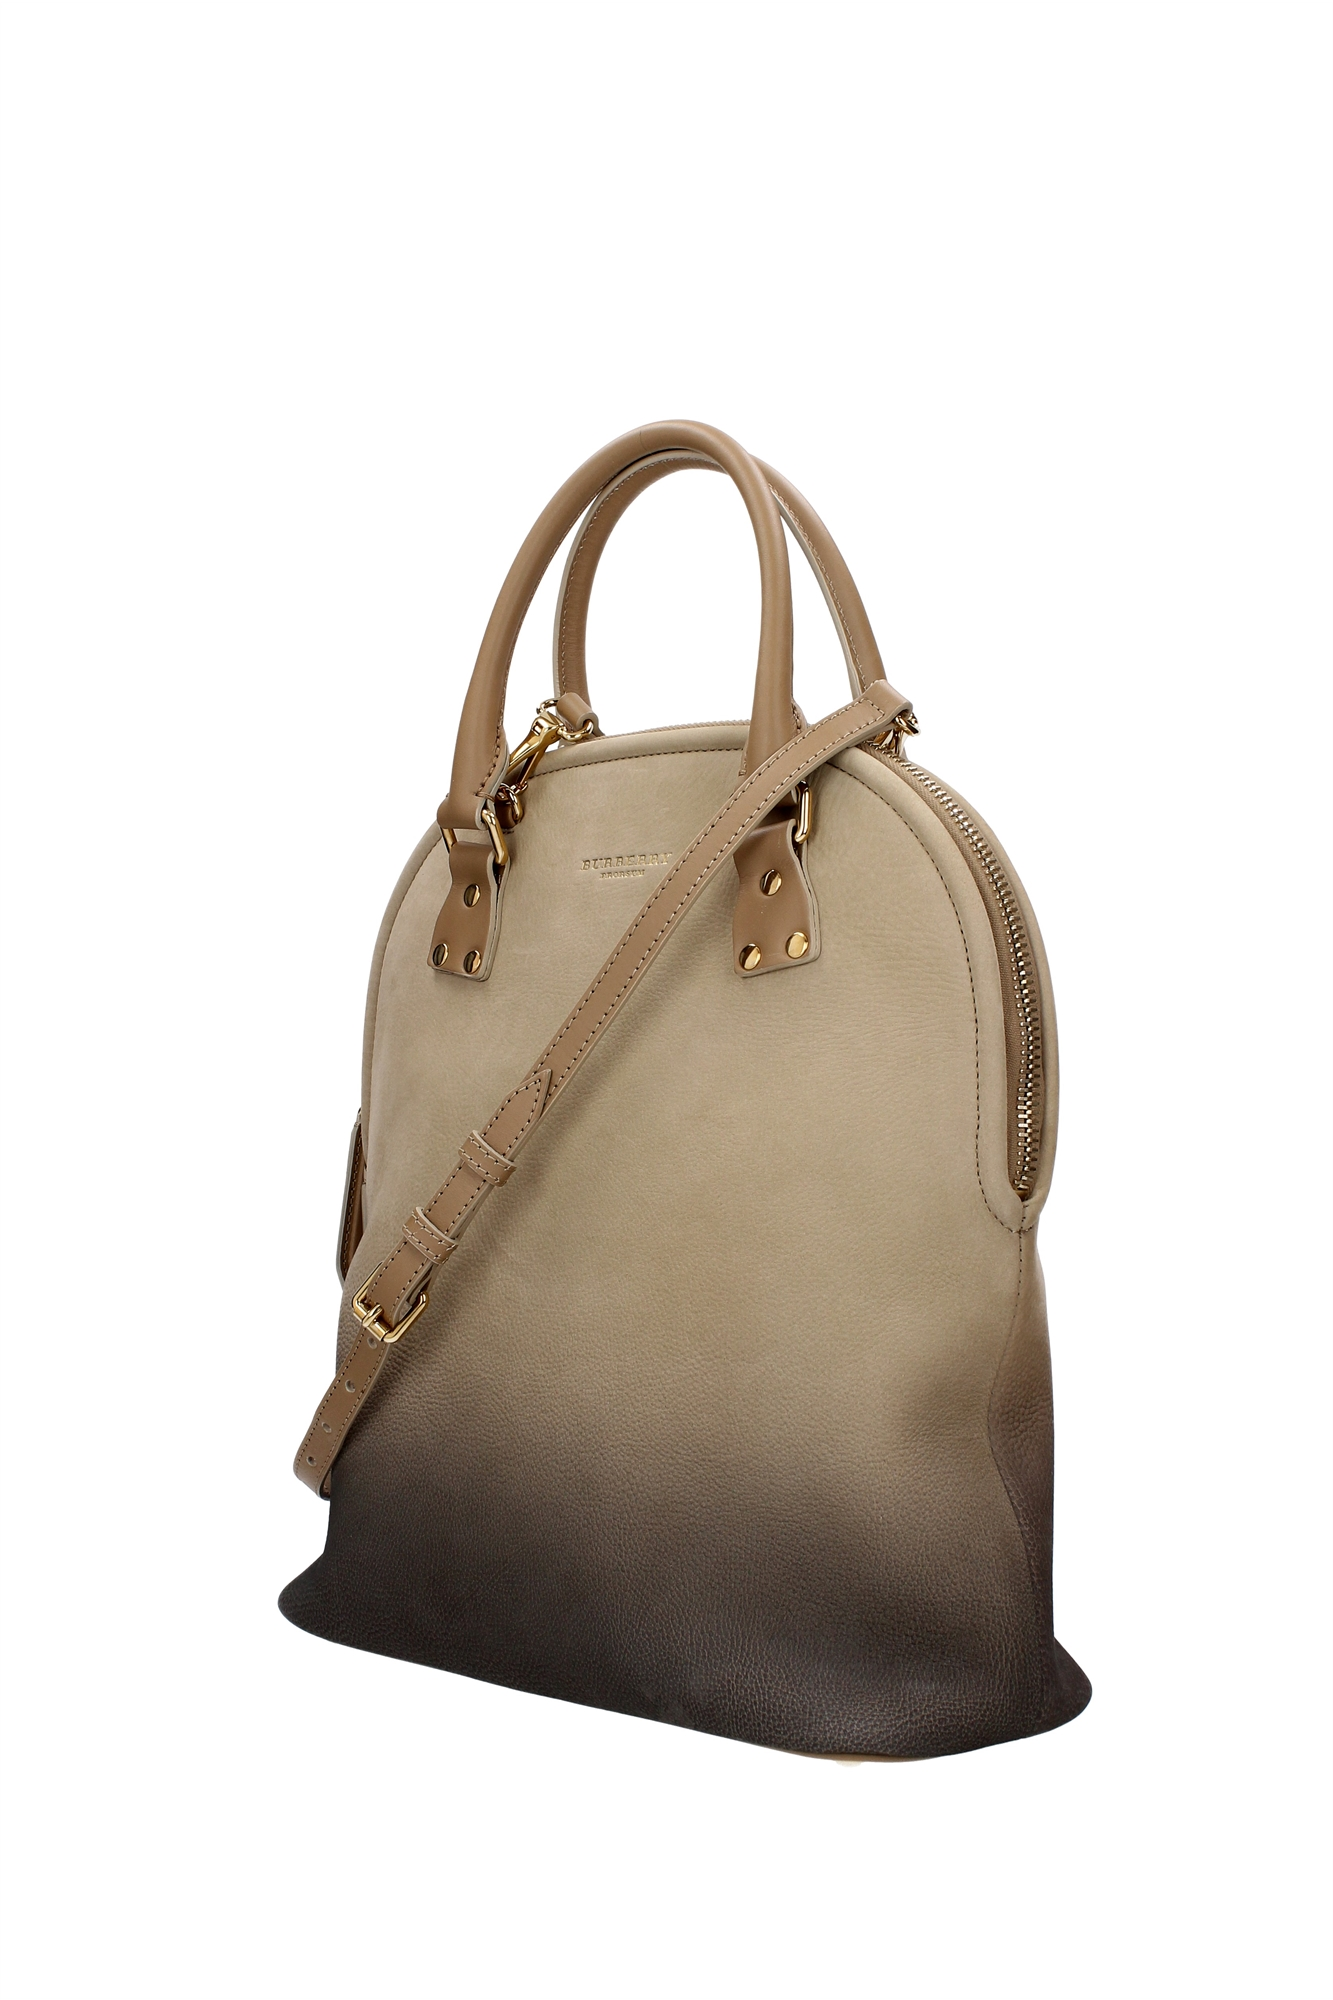 Hand Bags Burberry Women Leather Beige 3963280 | eBay